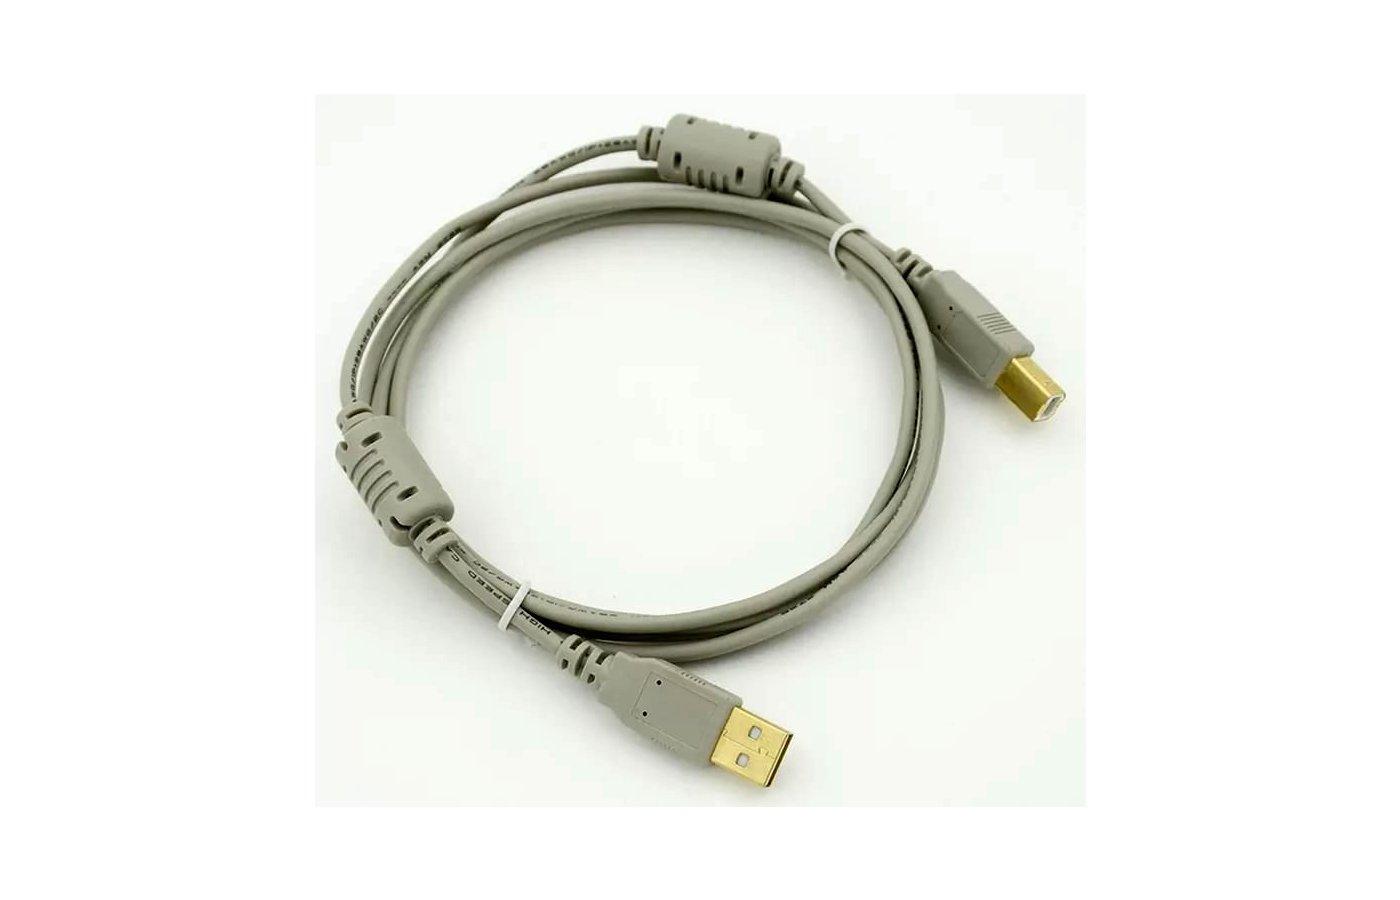 USB Кабель Кабель USB 2.0 PRO A(m) - B(m) феррит. фильт. 1.8м (58514)